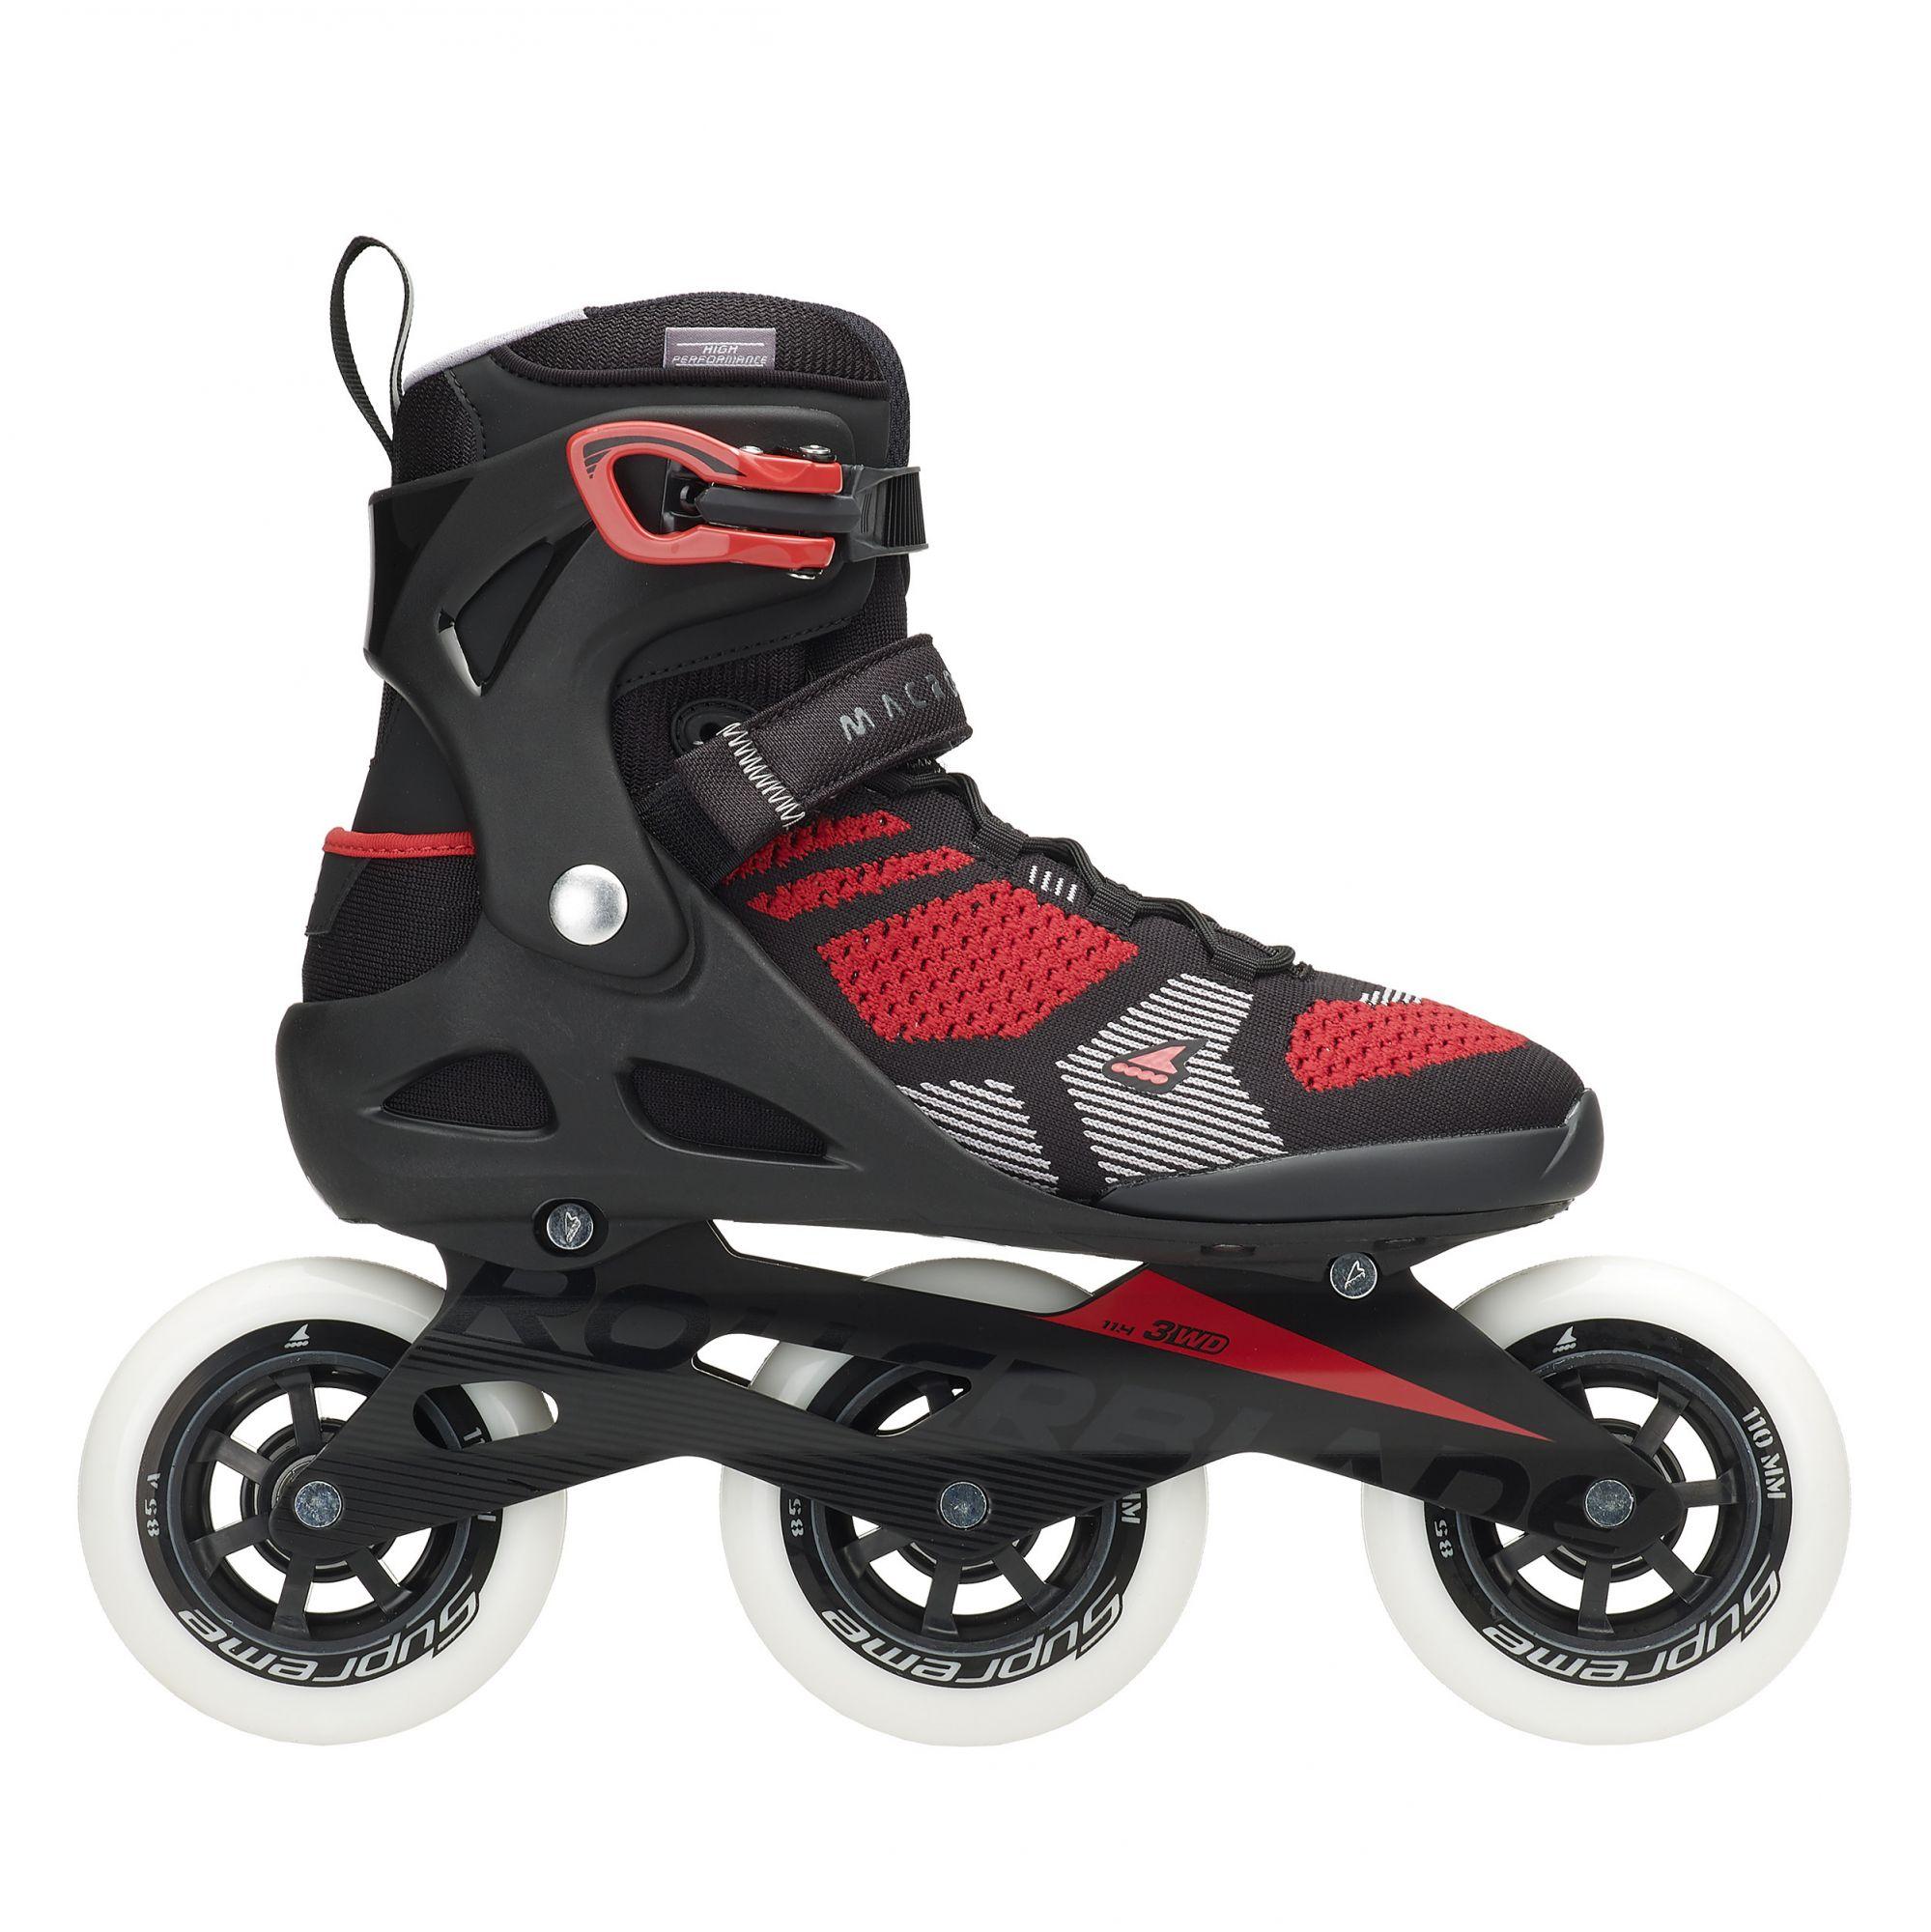 Rollerblade Macroblade 110 3WD Inline Skates - Black / Red - 40